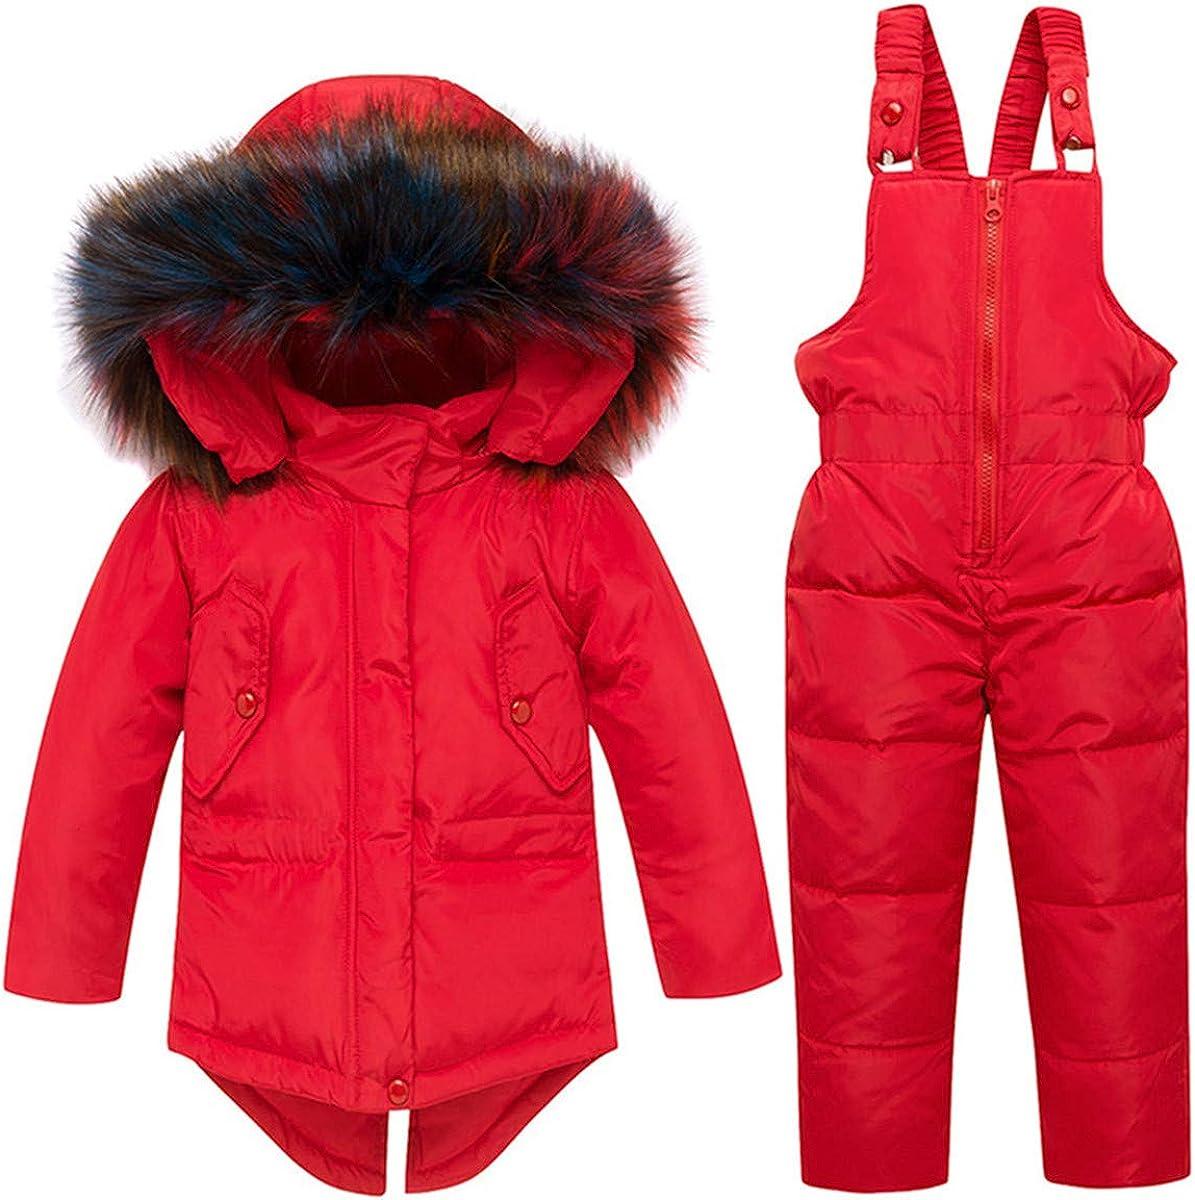 REWANGOING Baby Girls Winter Warm 2pcs Fur Trim Hooded Puffer Down Jacket Snowsuit+Snow Ski Bib Pants Set Outfits